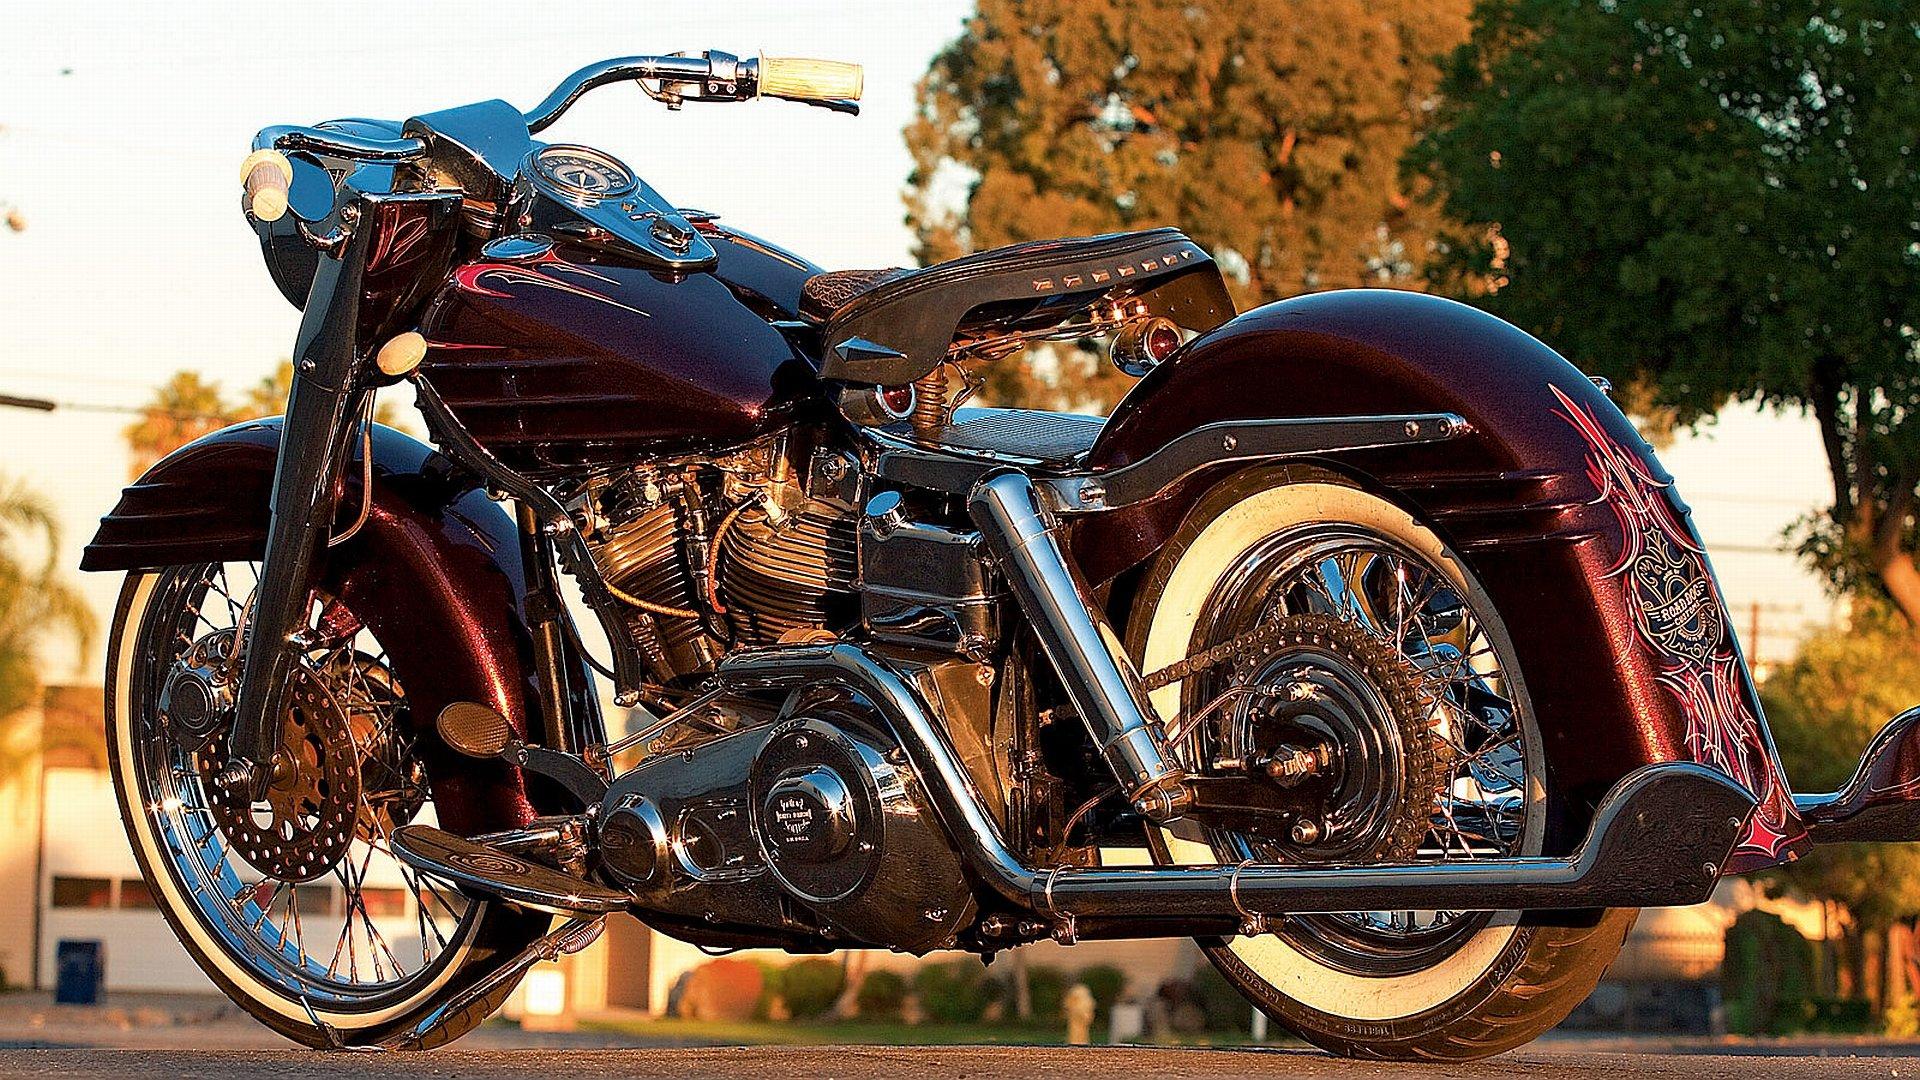 Download Full Hd 1080p Harley Davidson Computer Wallpaper Id